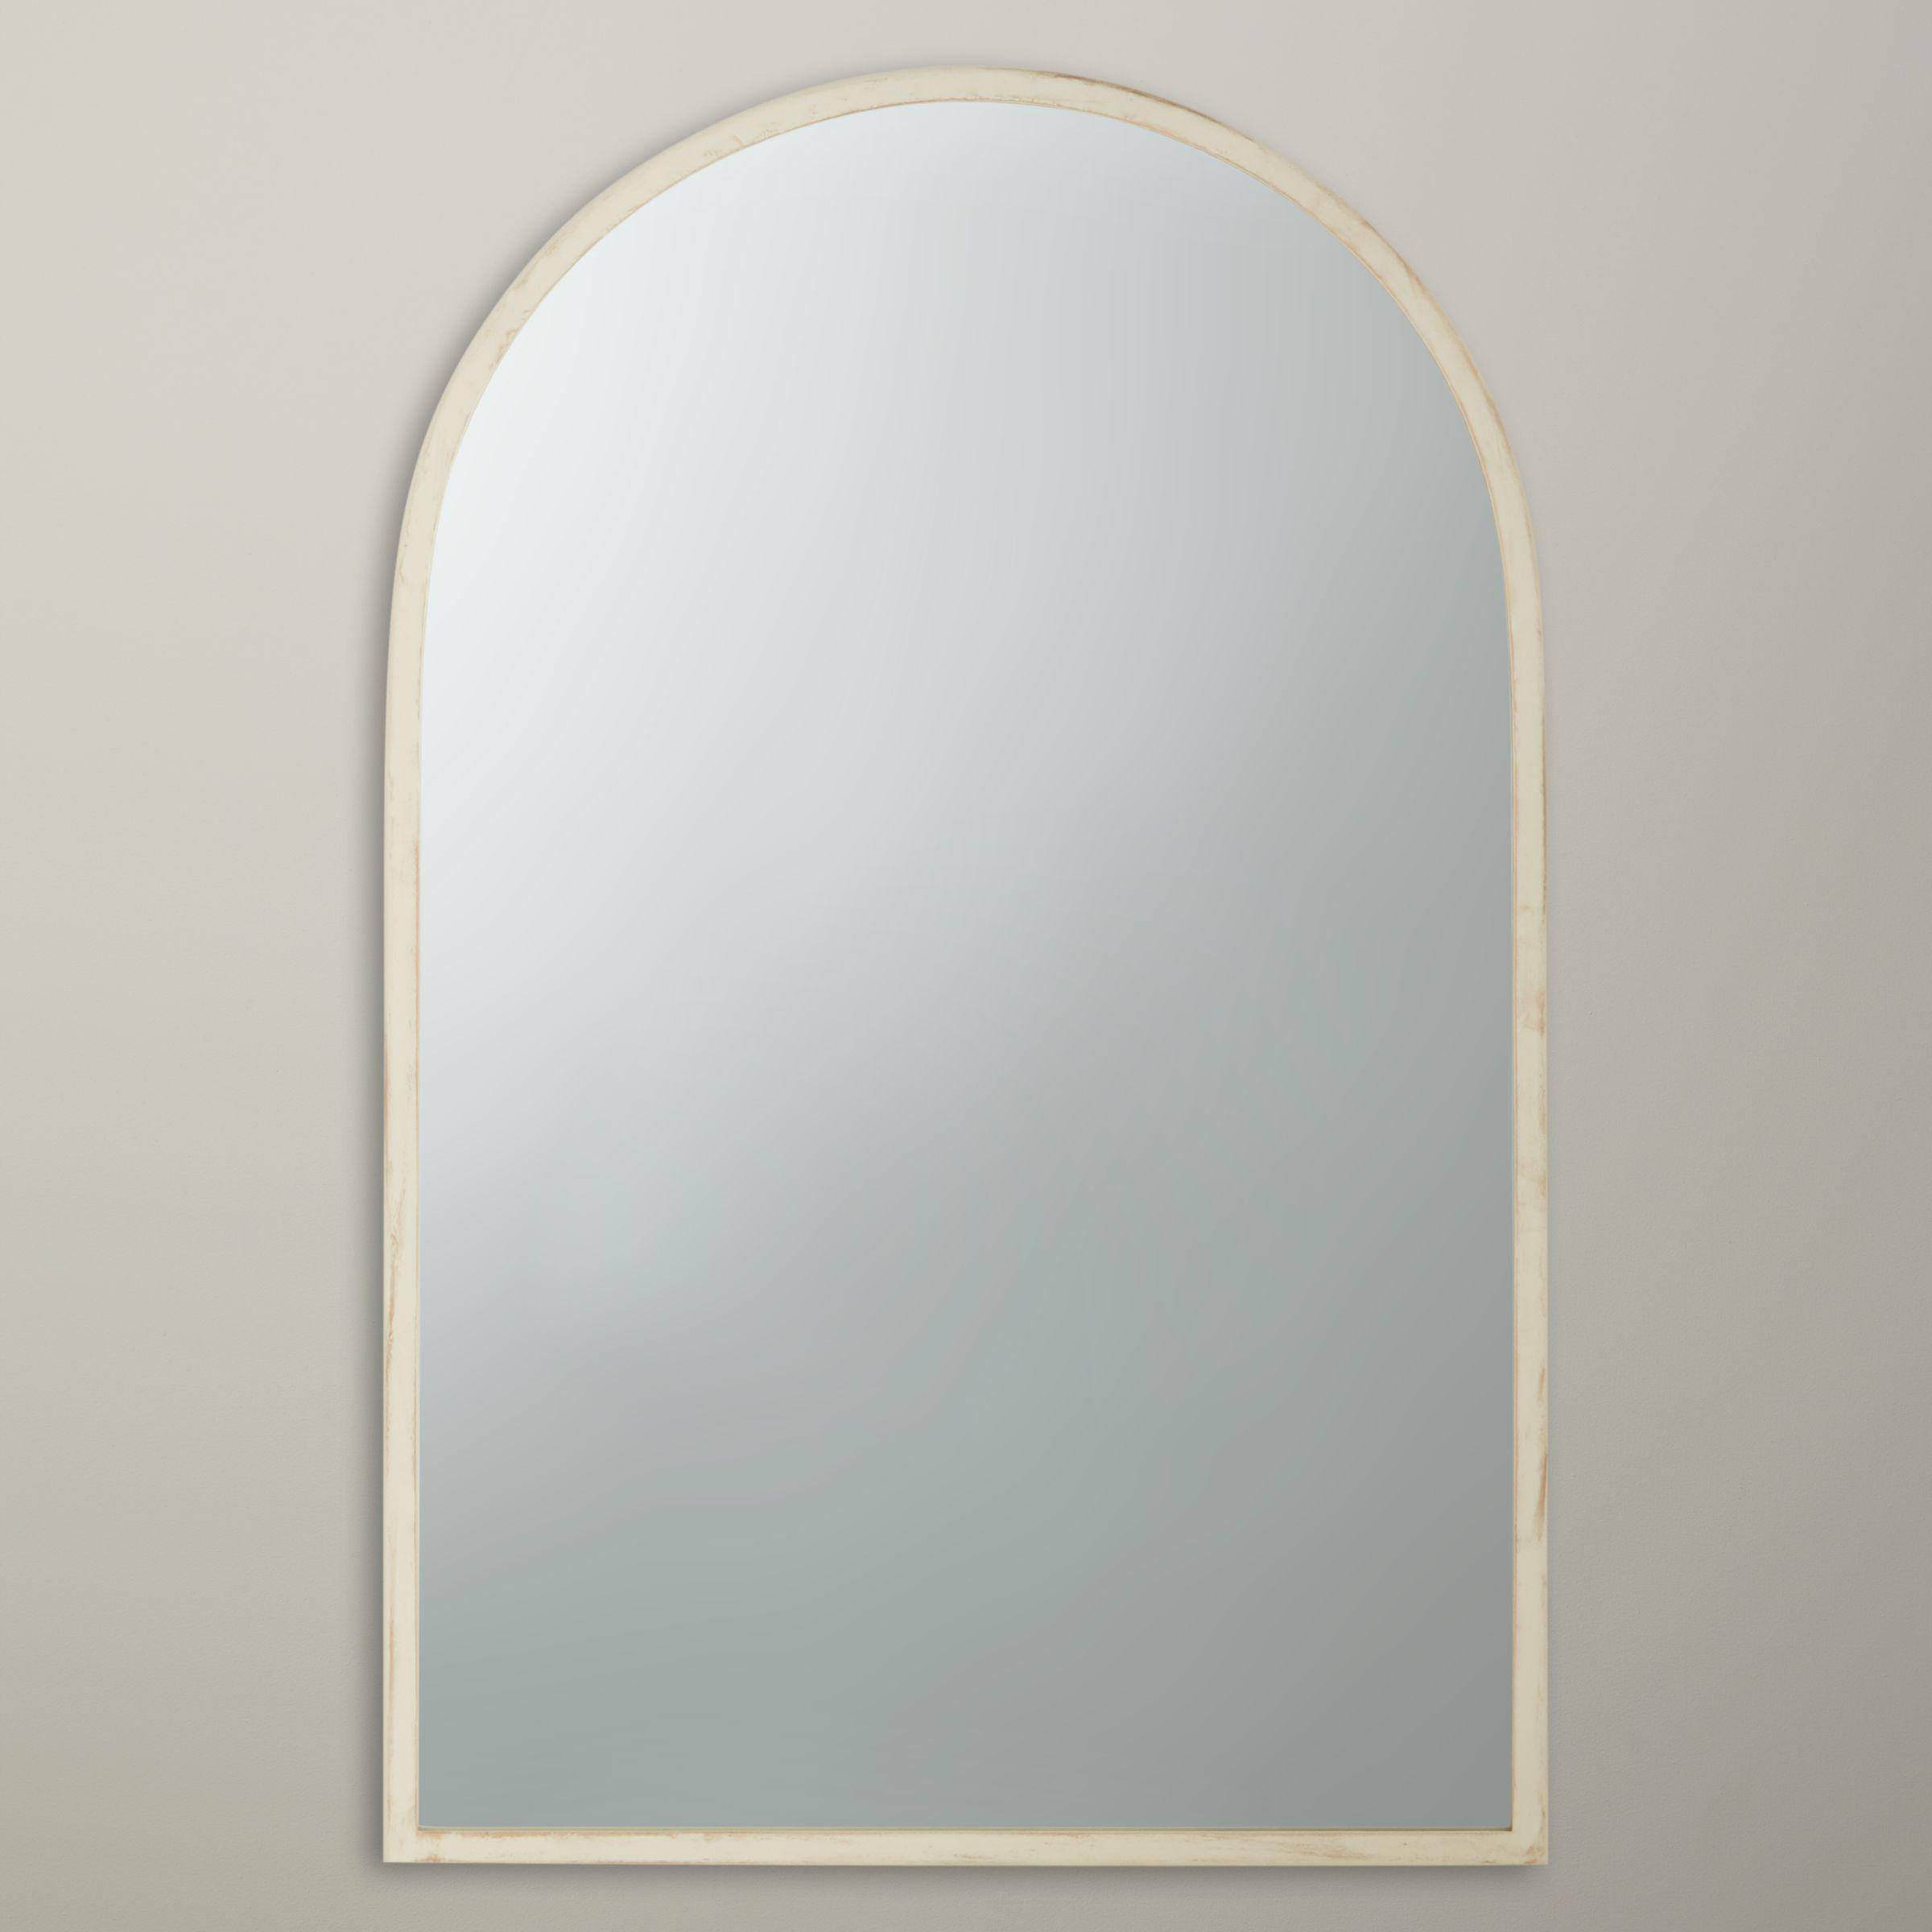 John Lewis Distressed Brass Arch Mirror White 71 X 40cm At John Lewis Partners